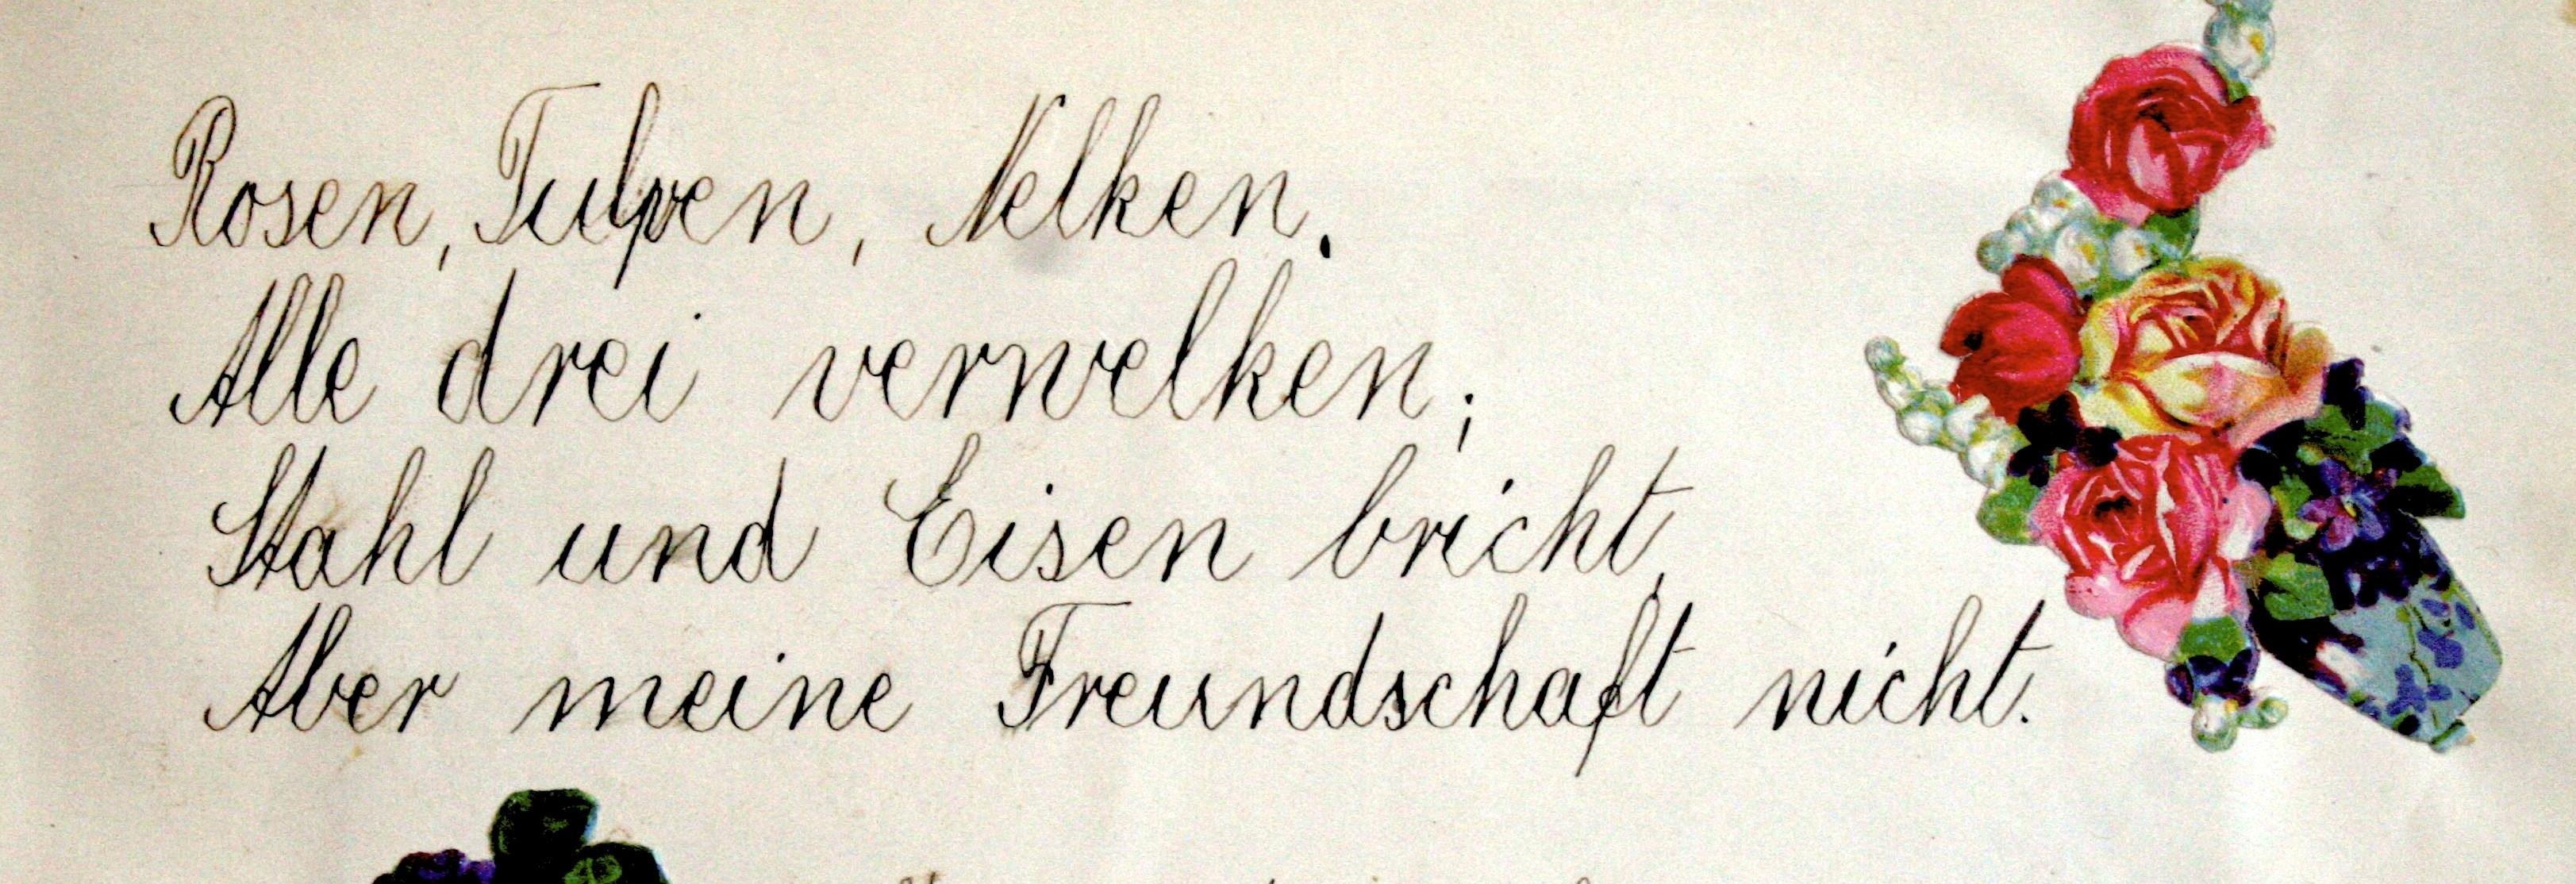 Poesiealbum_1929-e1436466014185